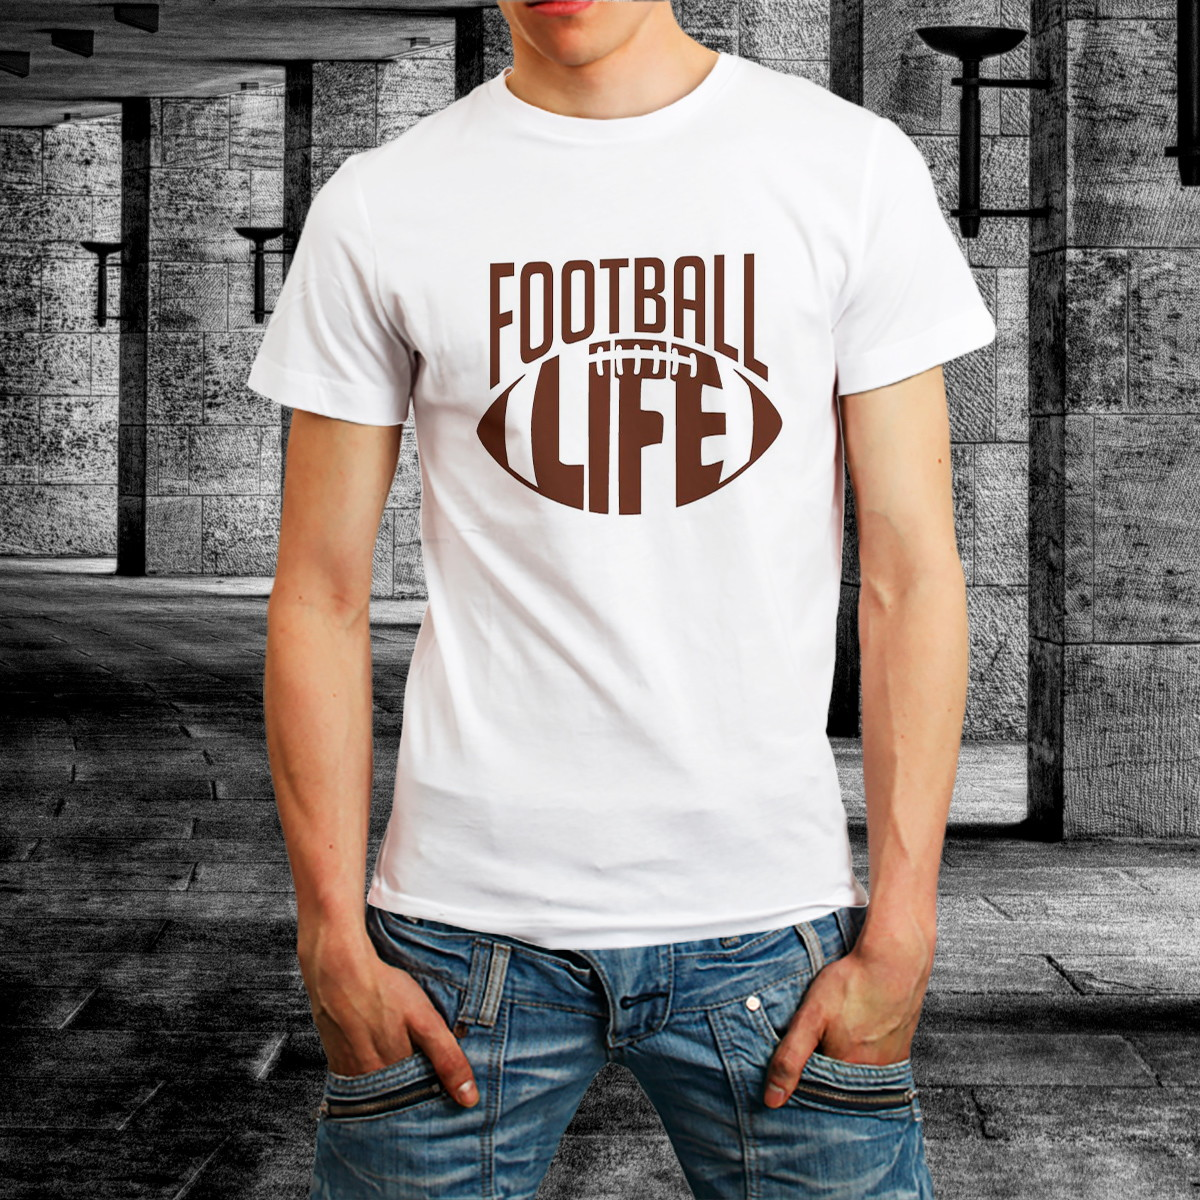 89930b3872 Camiseta Futebol Americano Camisa Football Homem Roupa no Elo7 ...